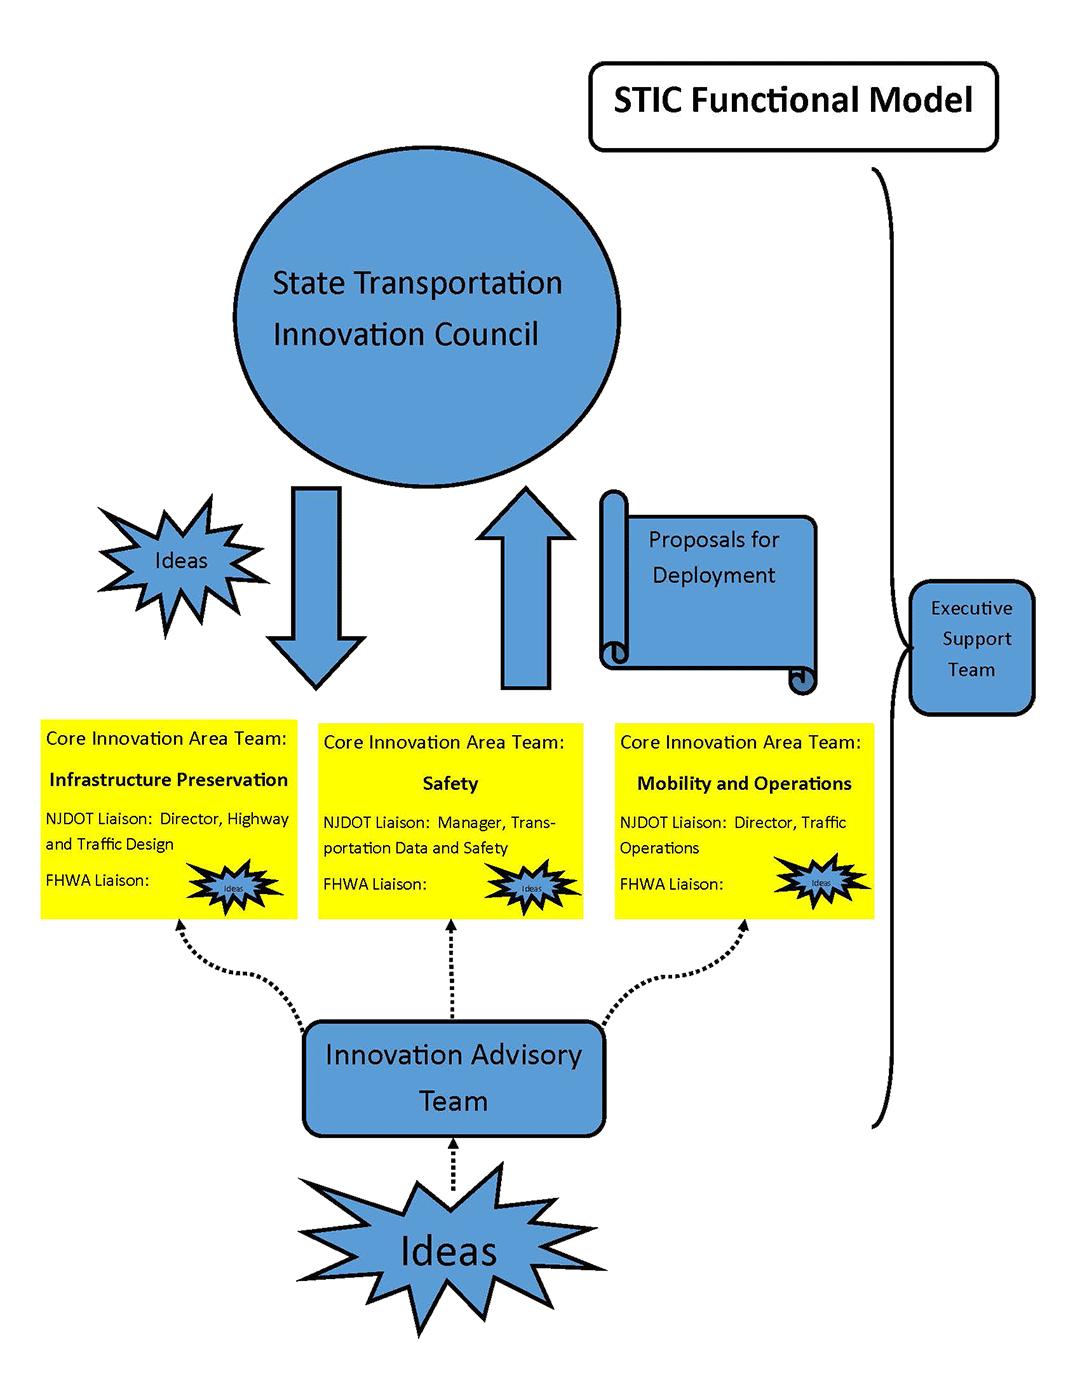 model a trans diagram nj stic functional model njdot technology transfer  nj stic functional model njdot